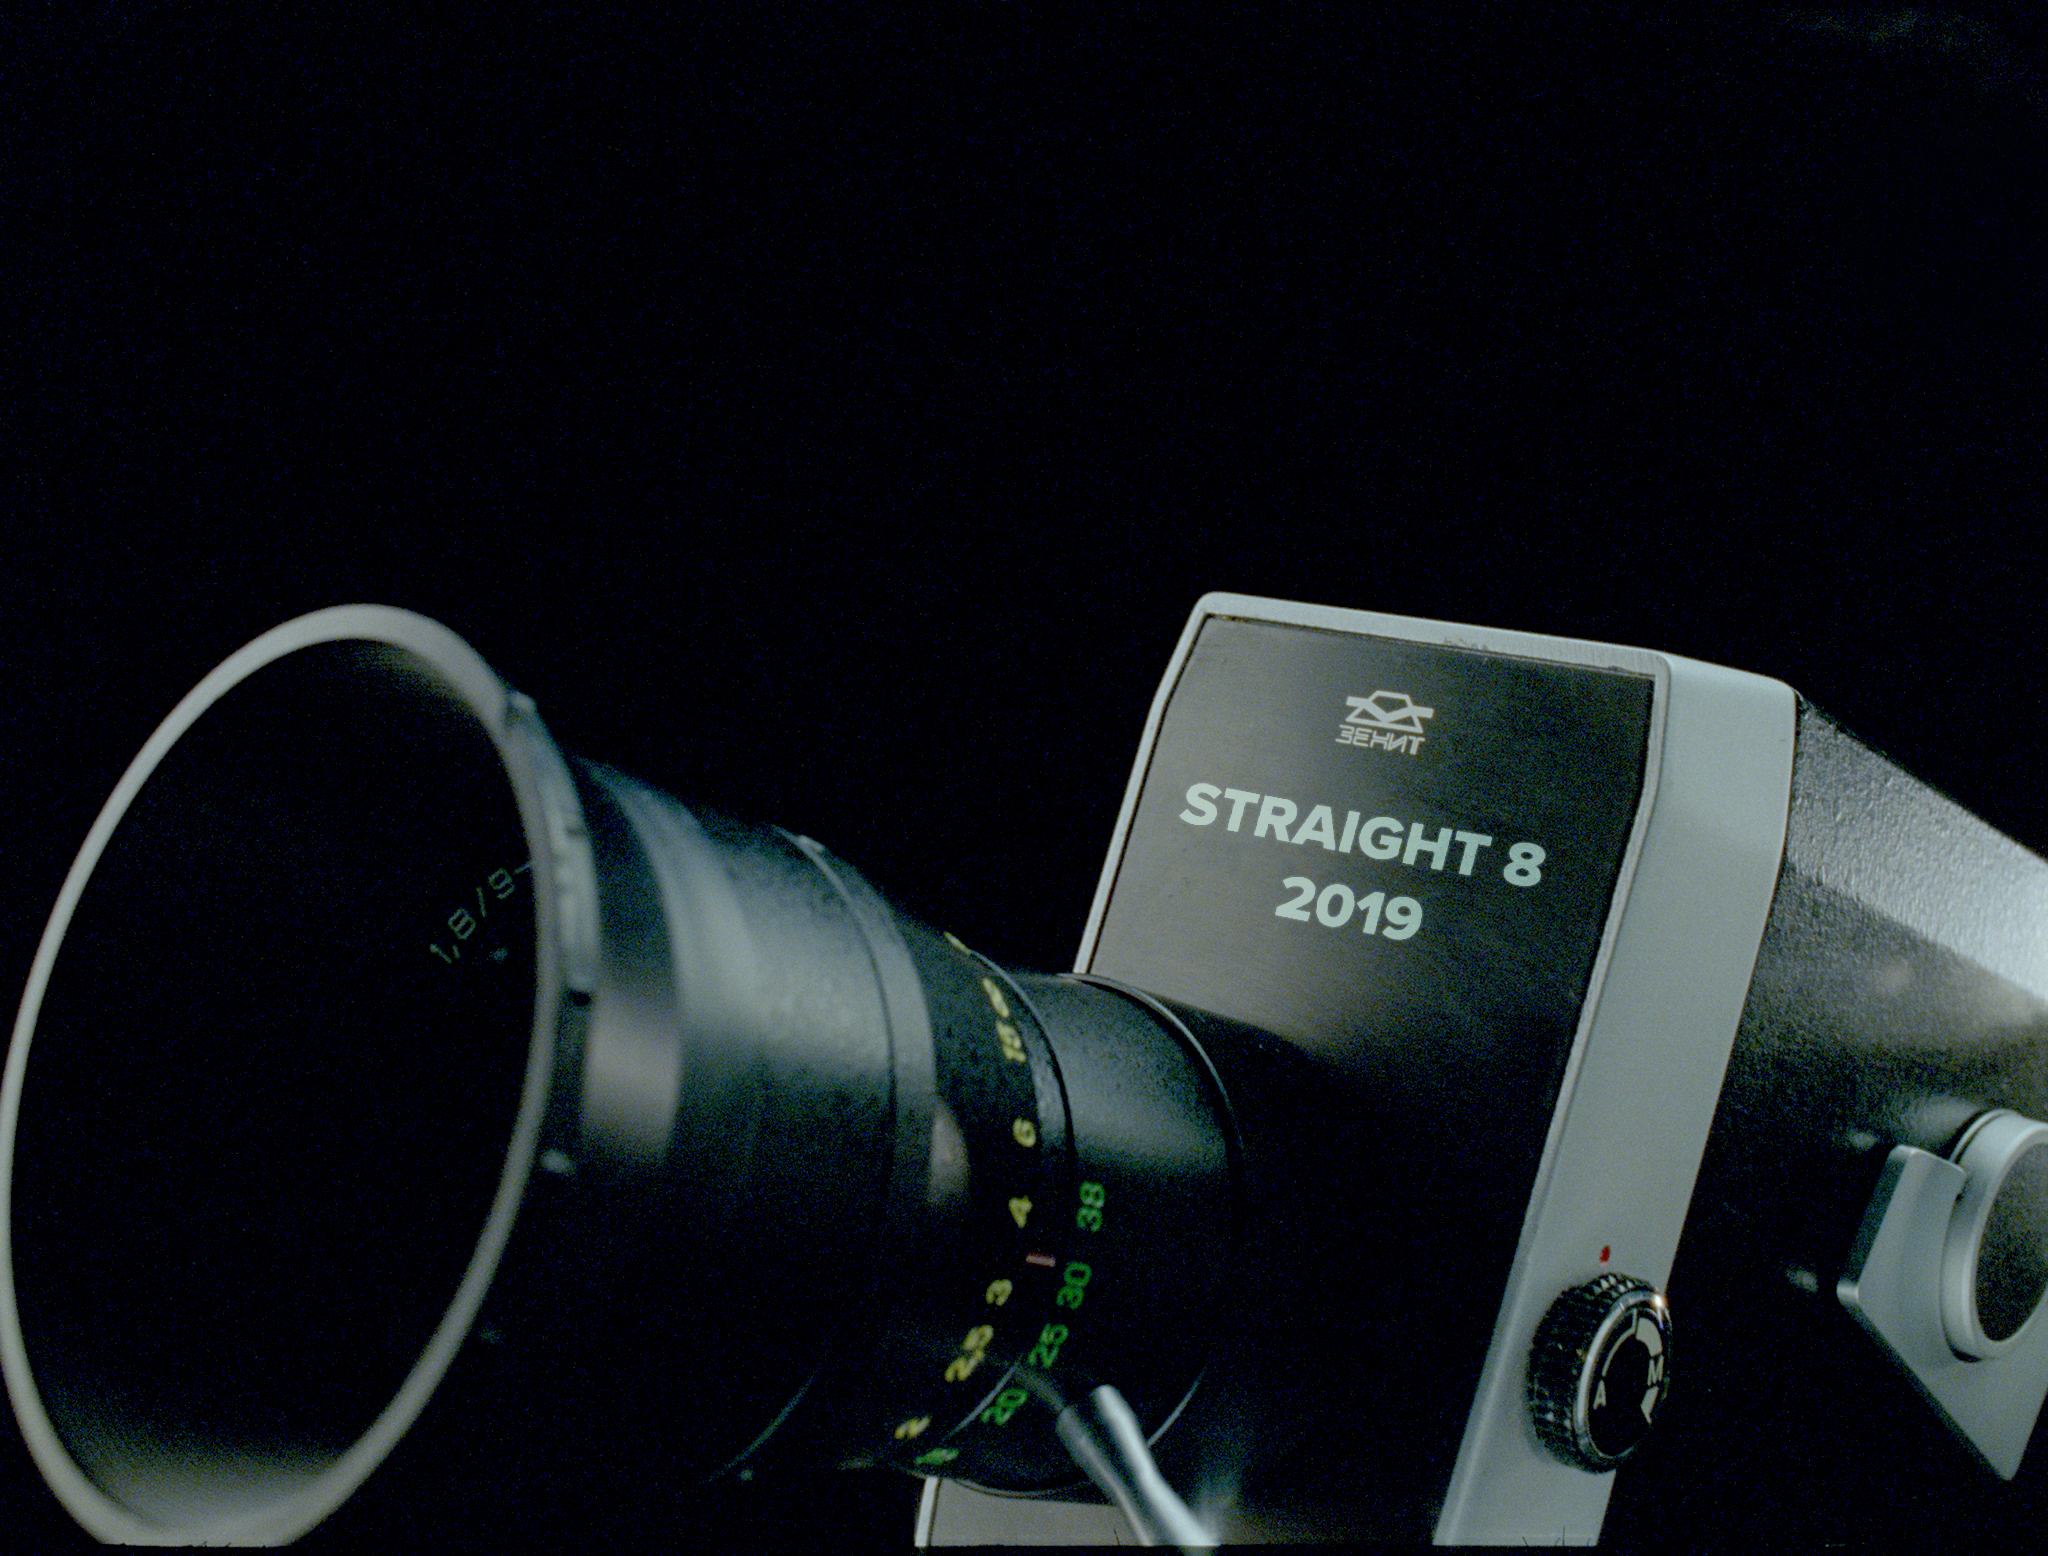 straight 8 2019 camera image